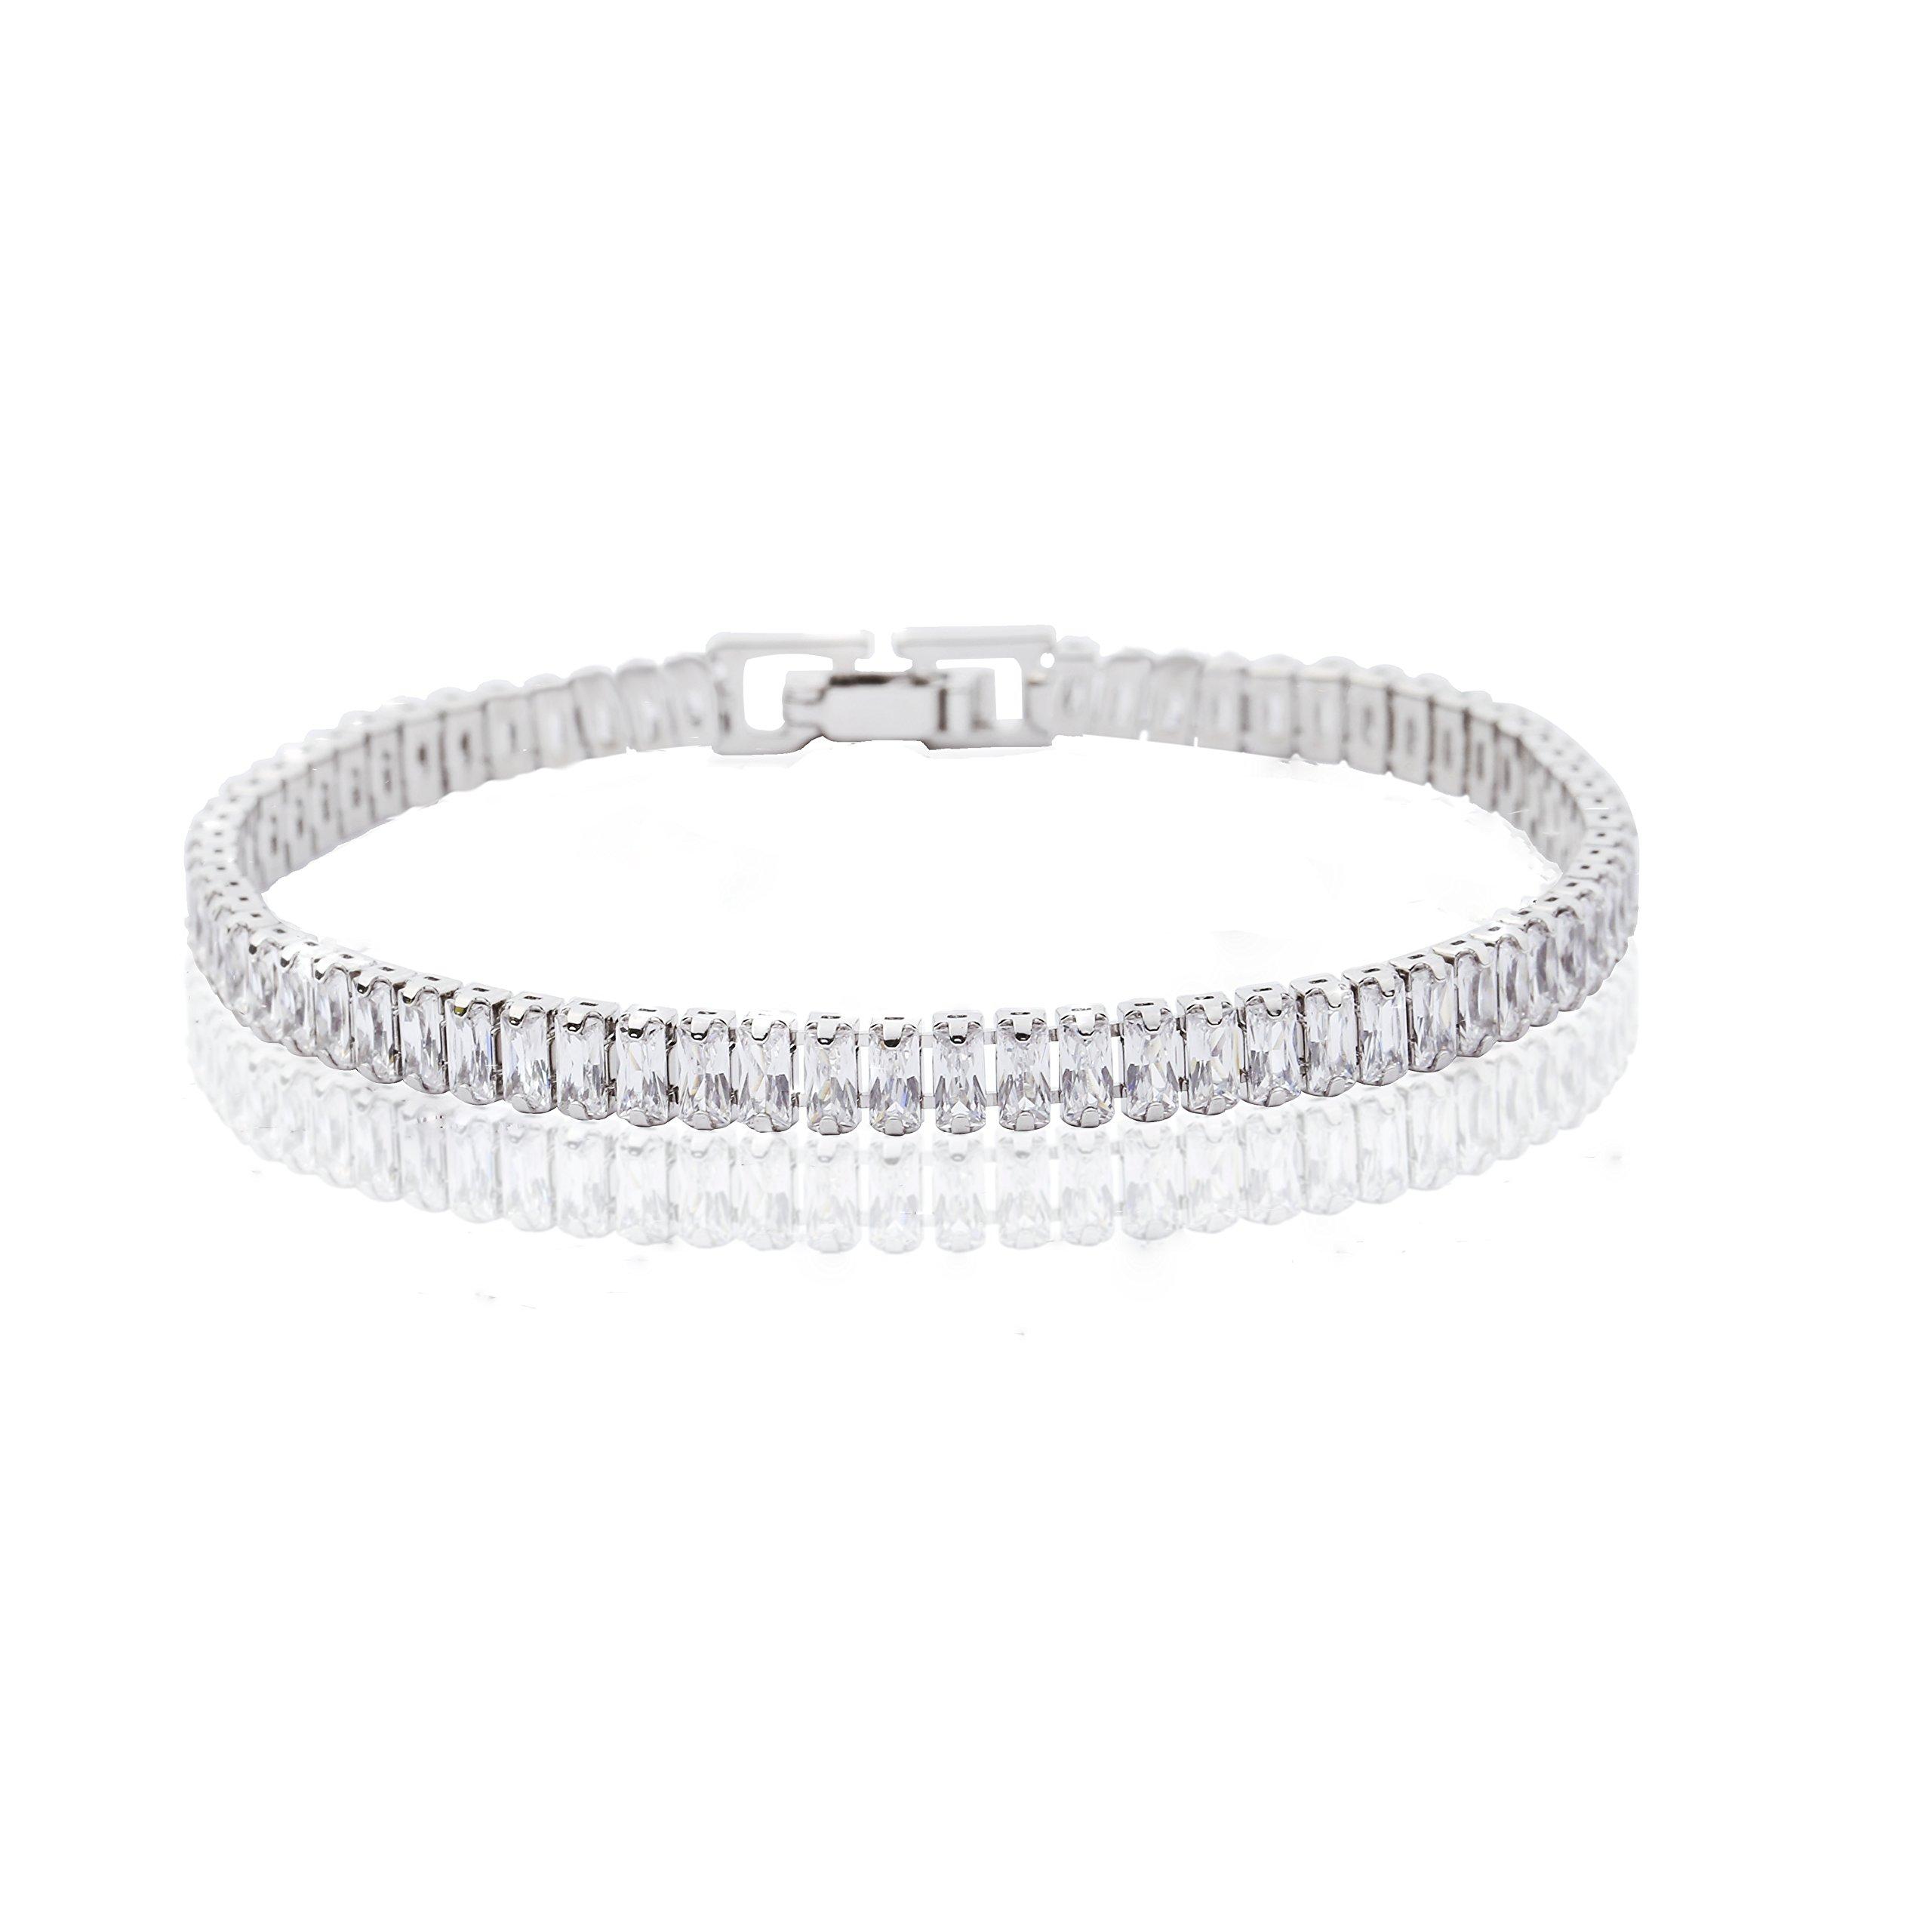 MYKEA Women's Simple Elegant Tennis Bracelet 925 Sterling Silver with Sparkling Radiant Cut Crystal Swarovski Cubic Zirconia Jewelry for Women Girls Gift Idea